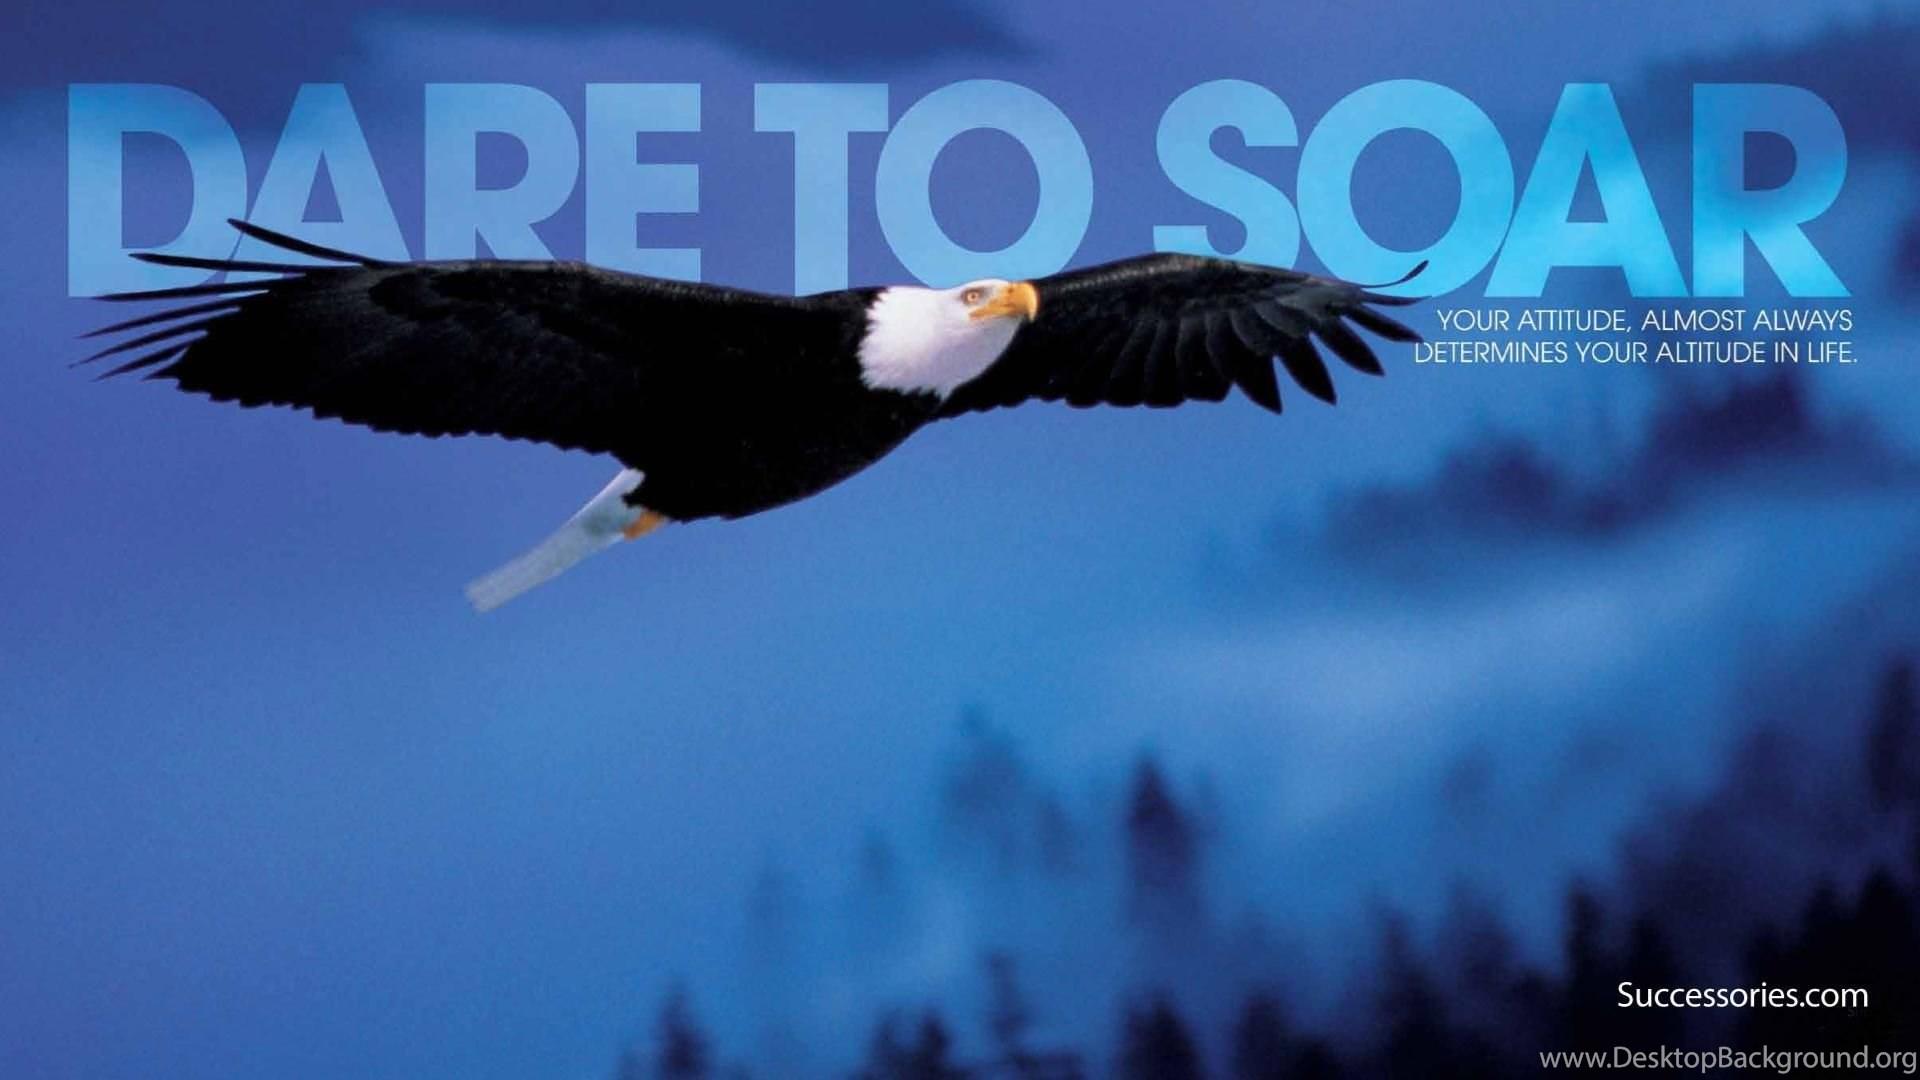 dare to soar wallpaper ( desktop background